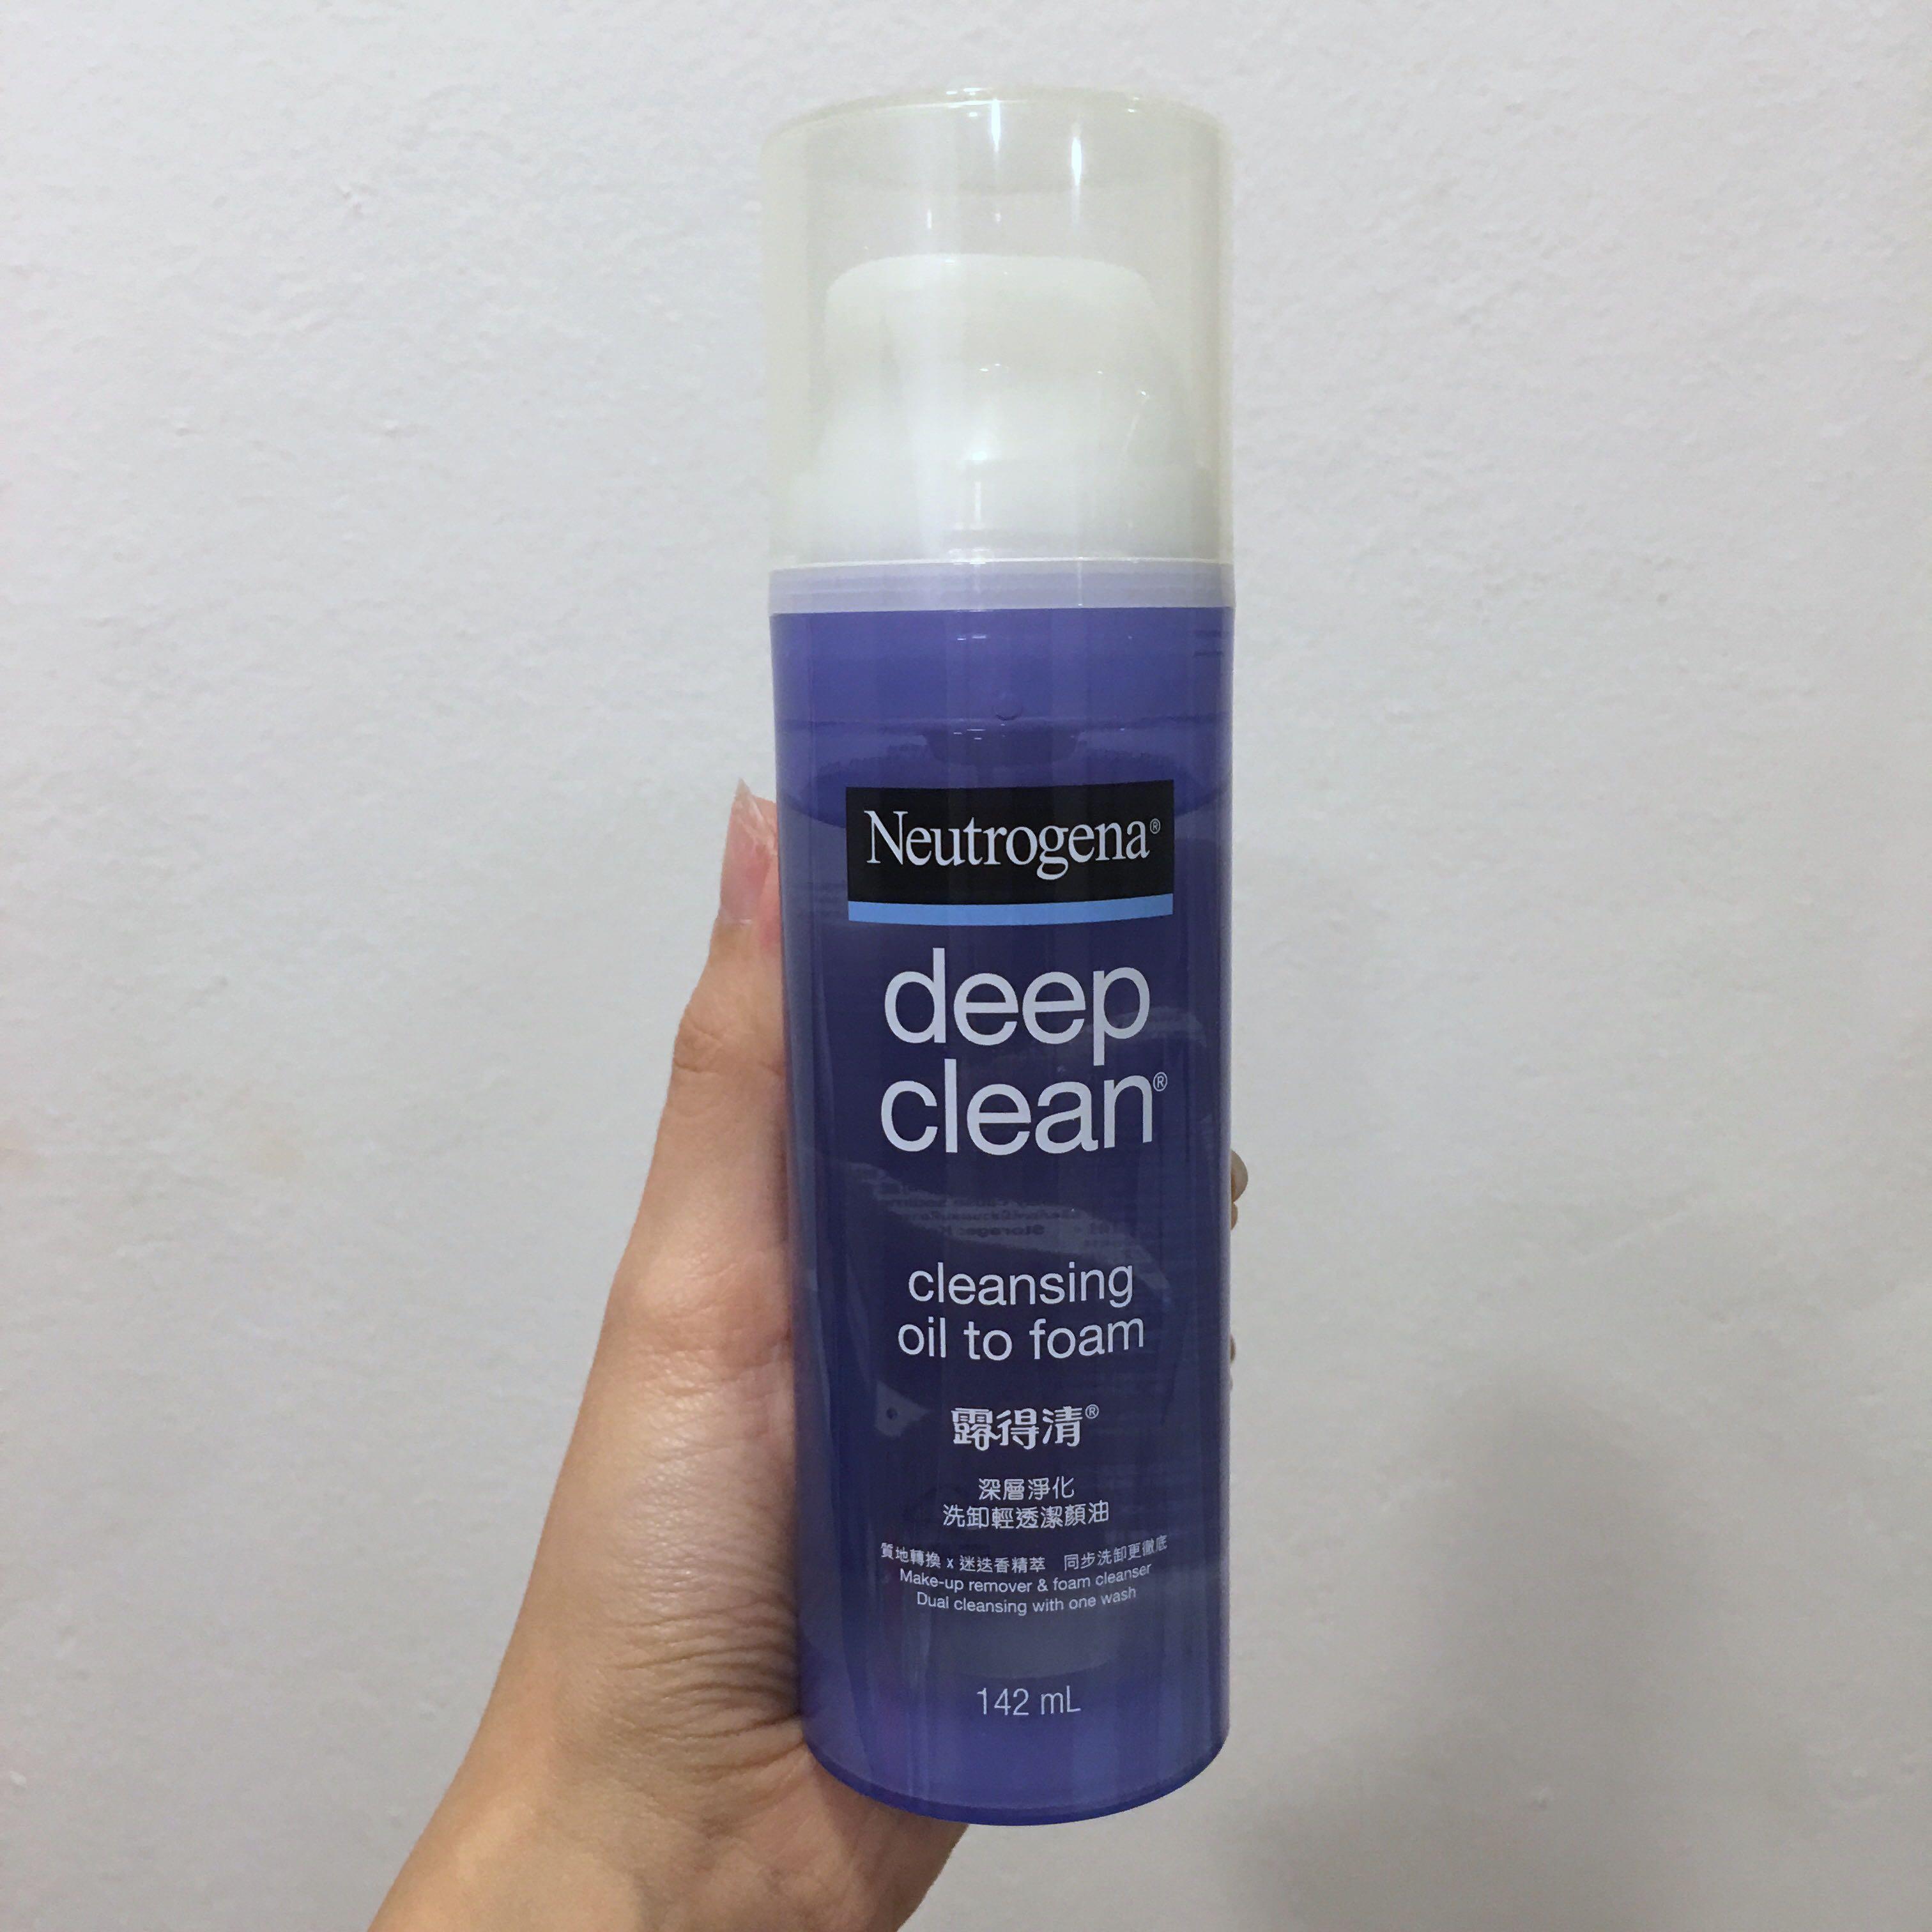 Neutrogena Deep Clean Cleansing Oil to Foam